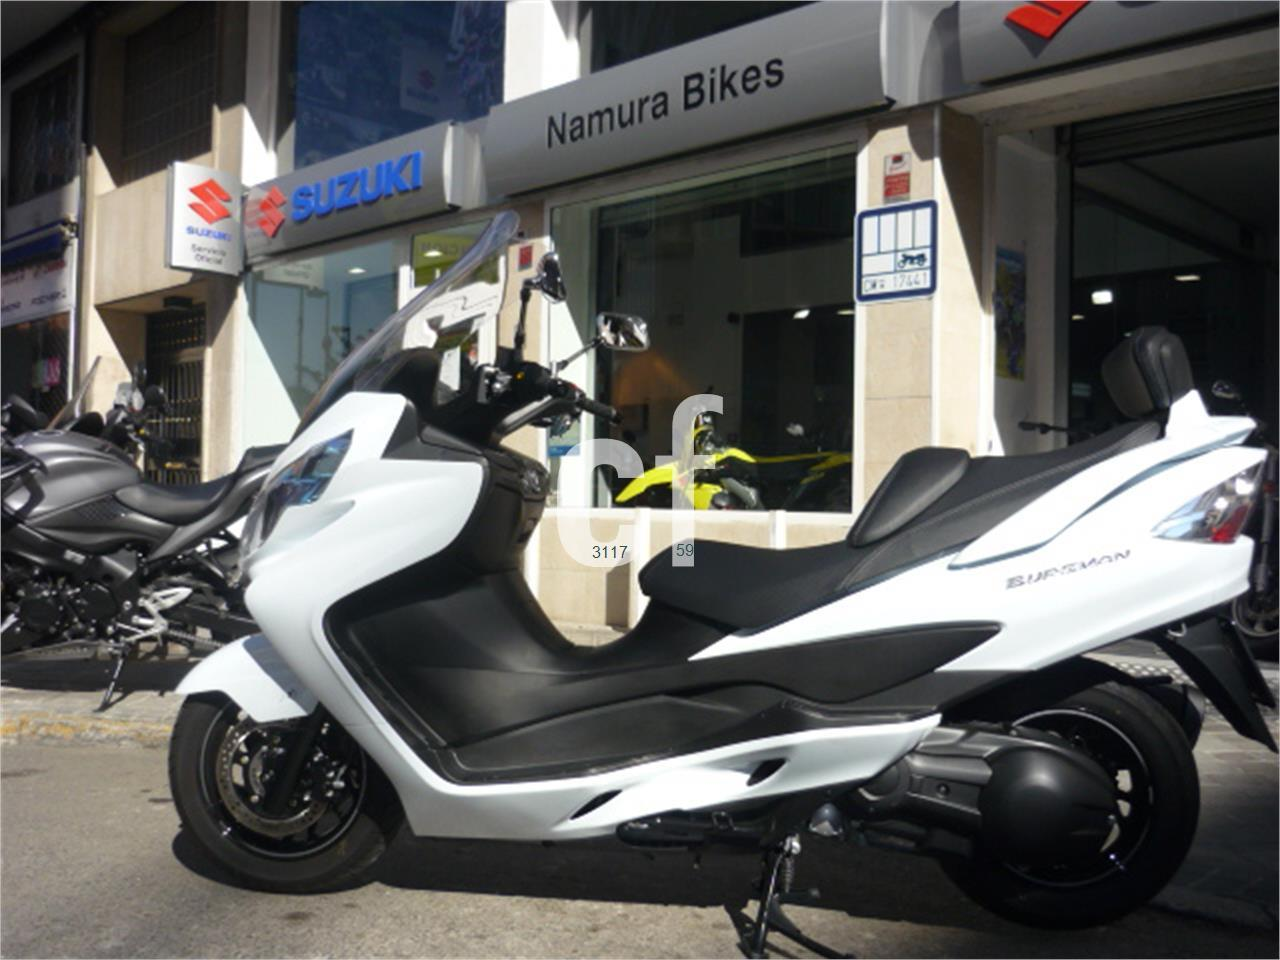 SUZUKI BURGMAN 400 ABS de venta